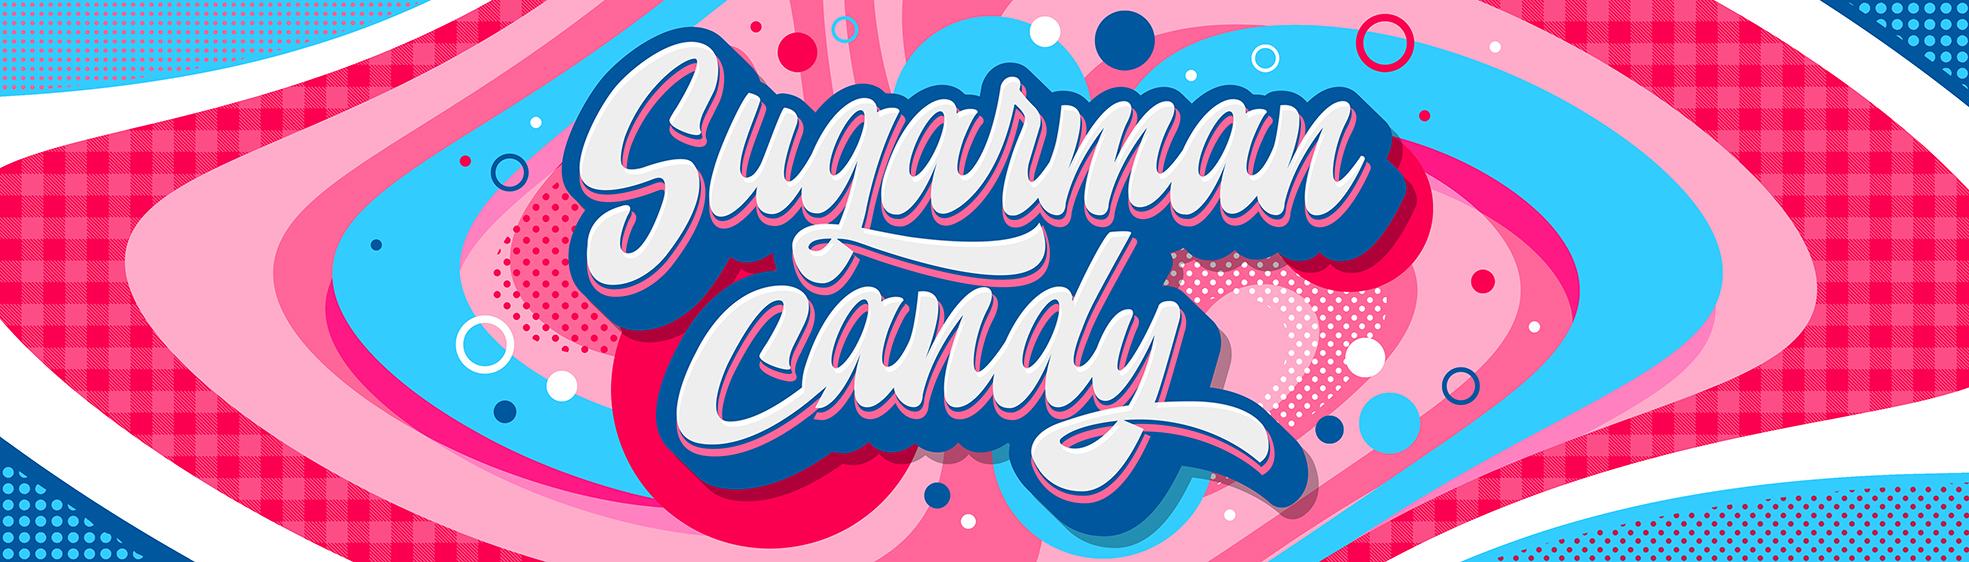 Sugarman Candy's logo